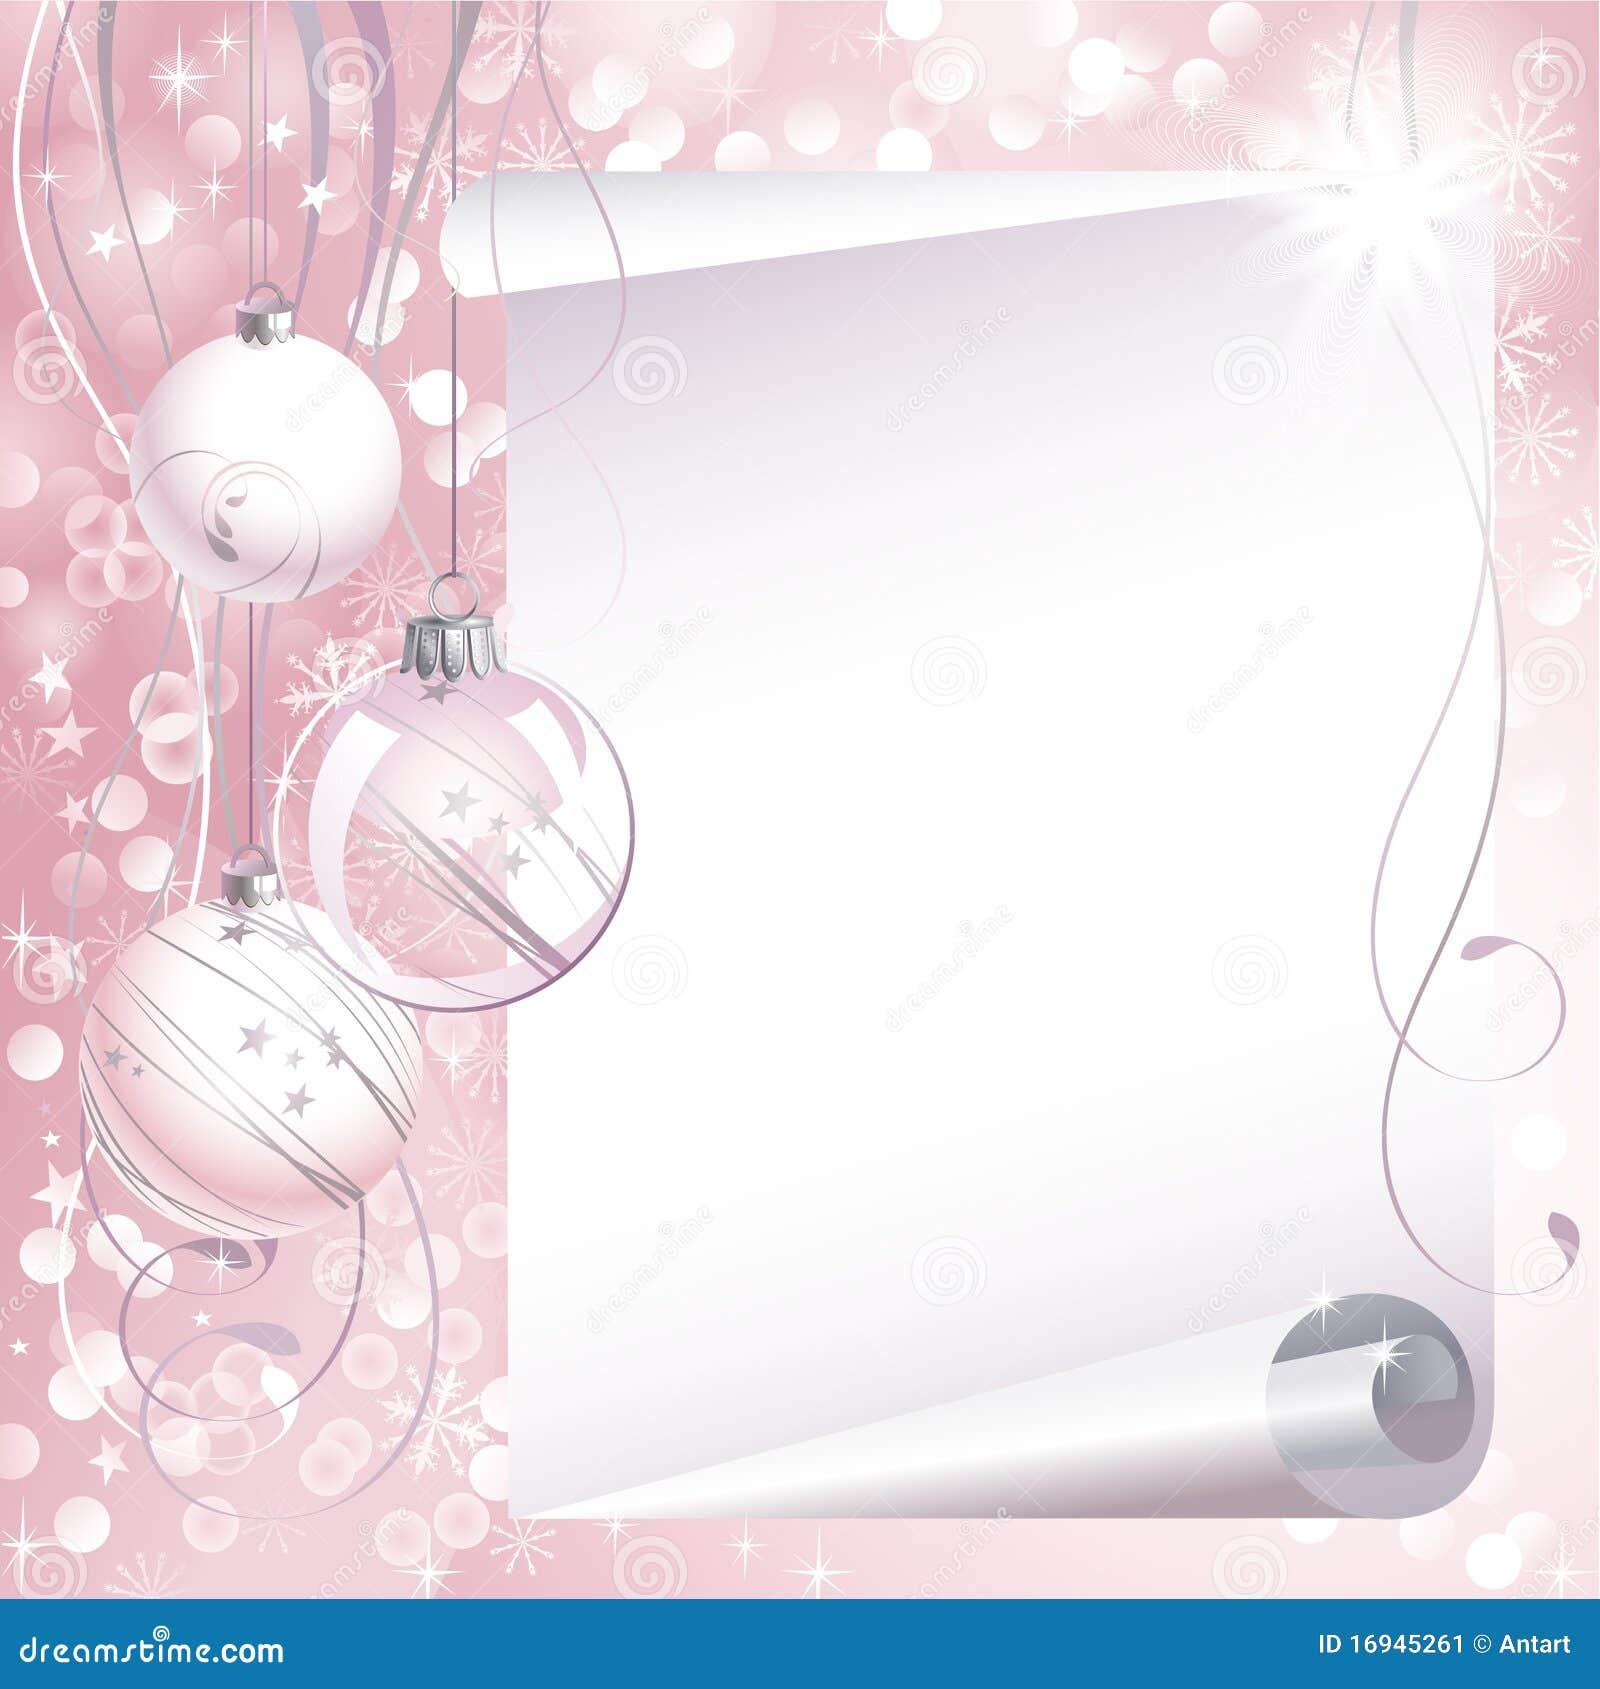 Pink Christmas Background Stock Image - Image: 16945261